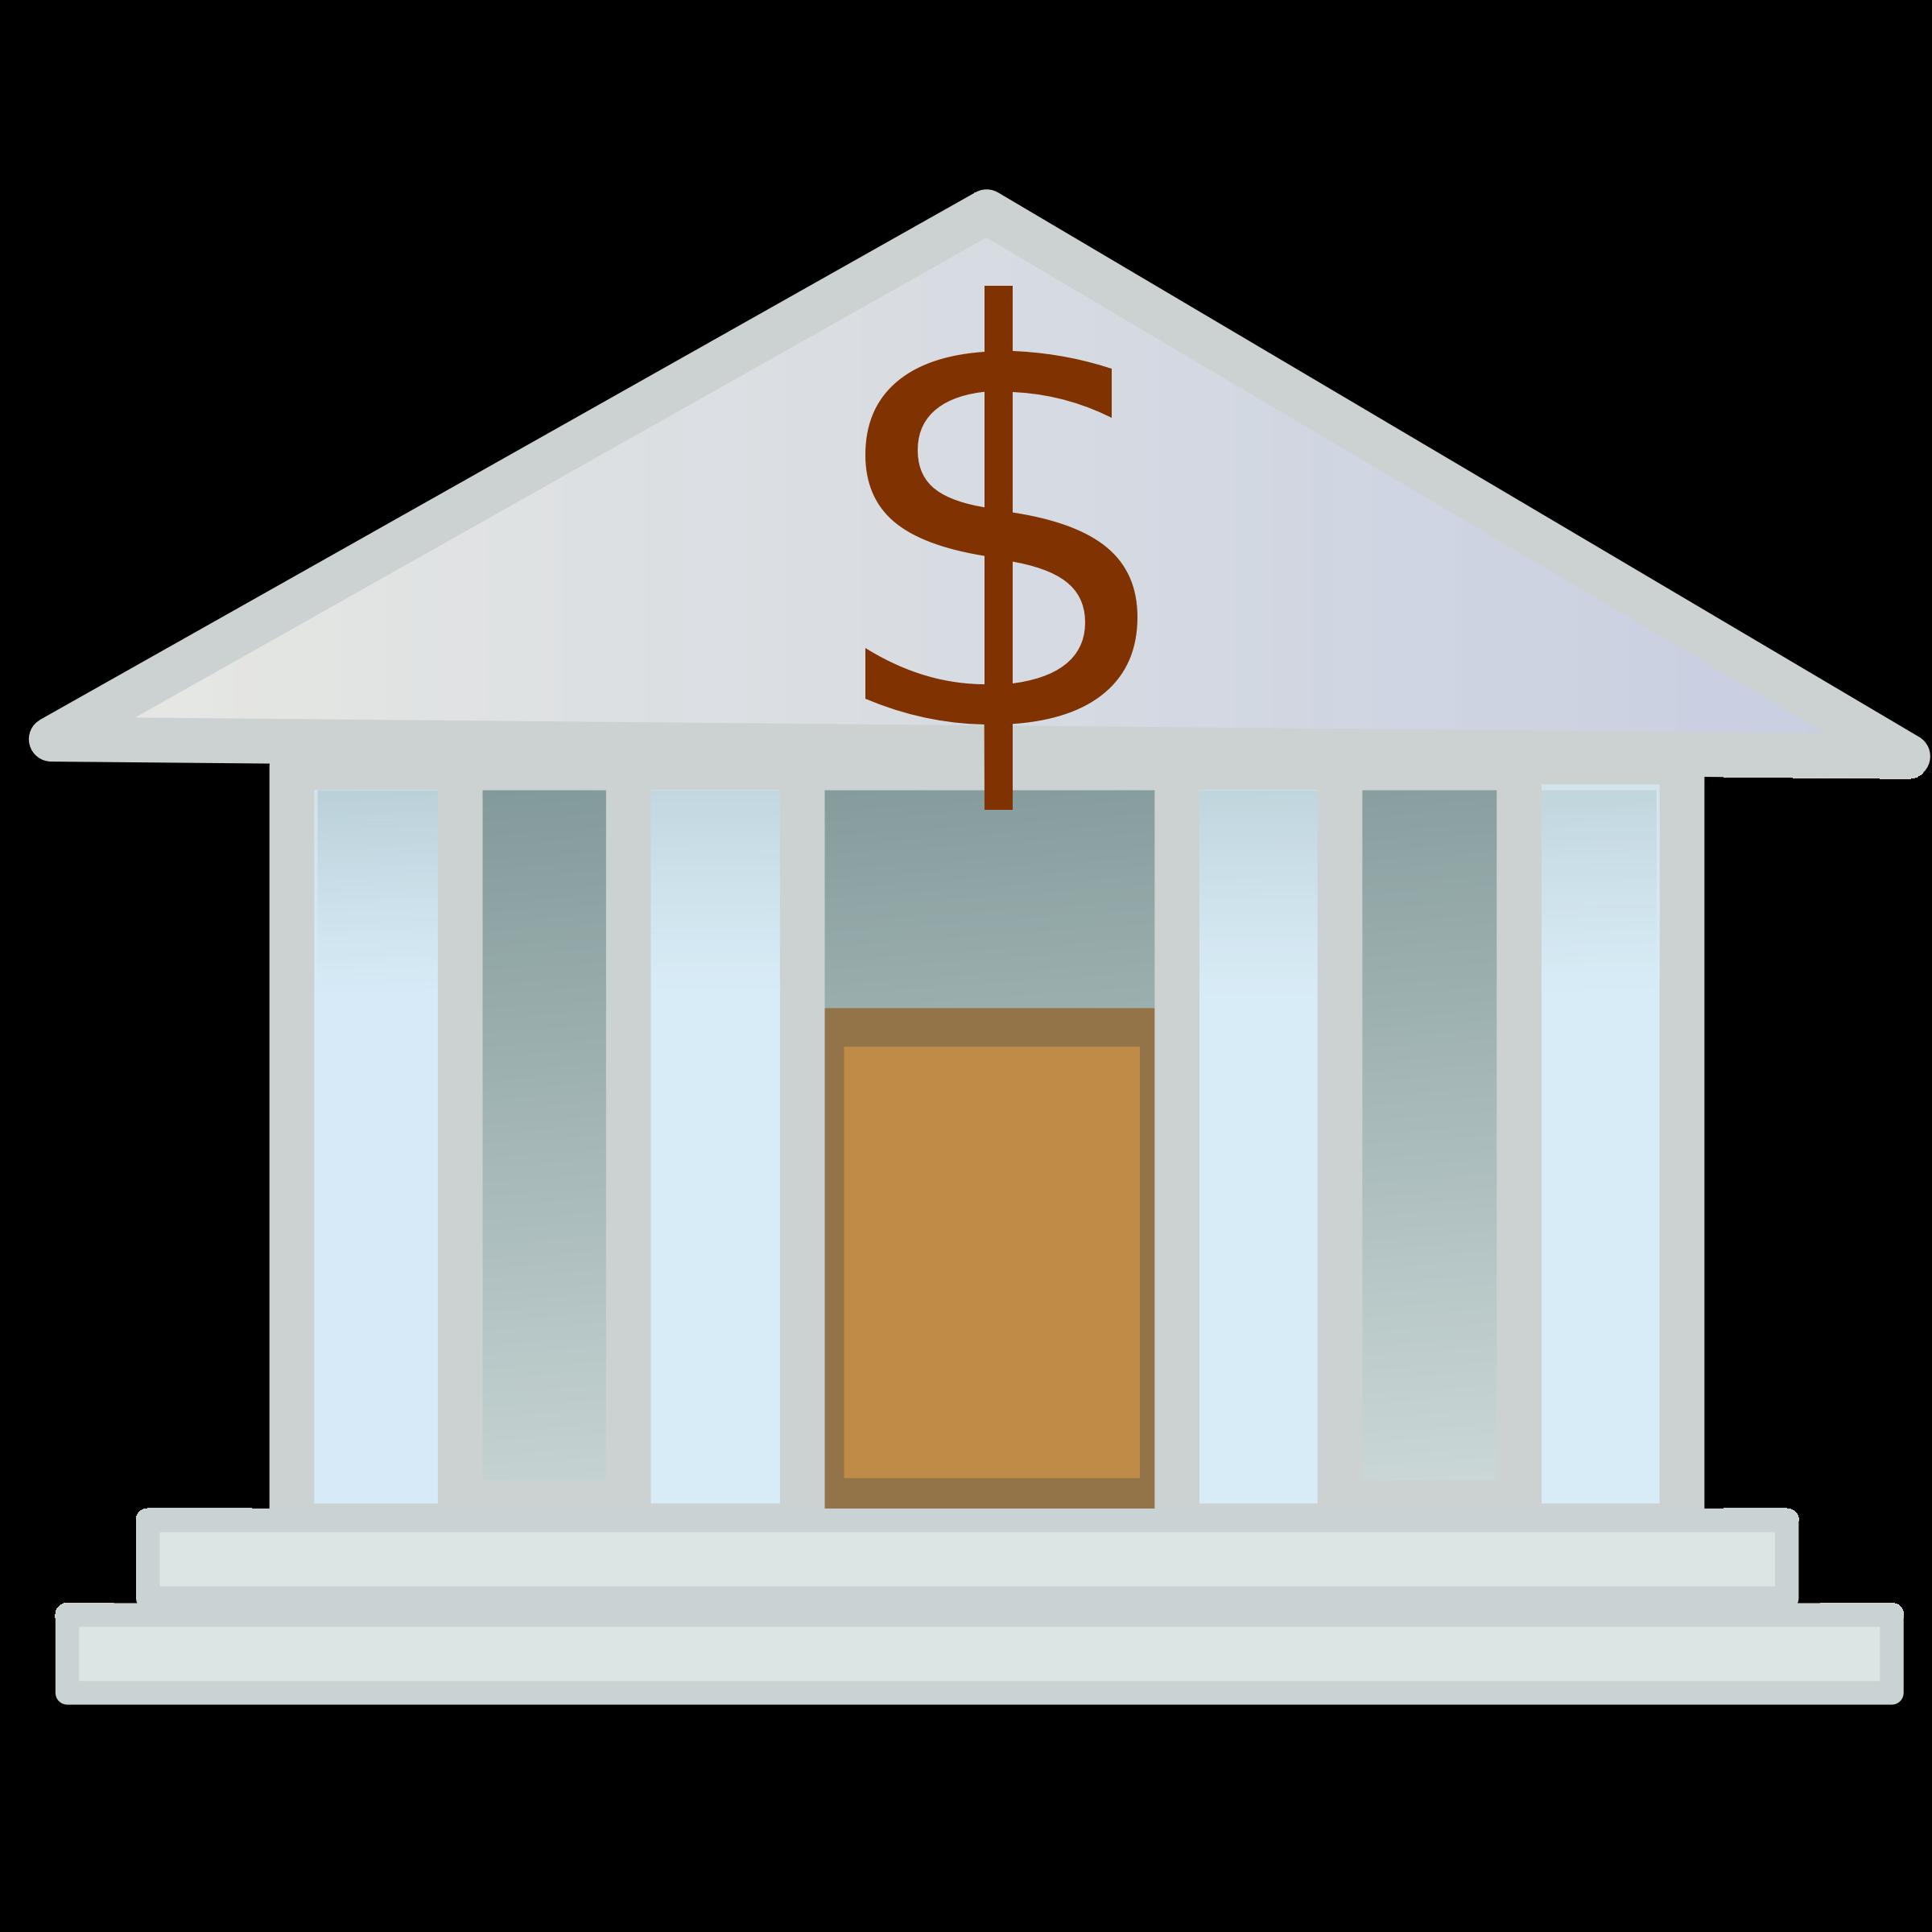 Bank clip art free. Money clipart tower